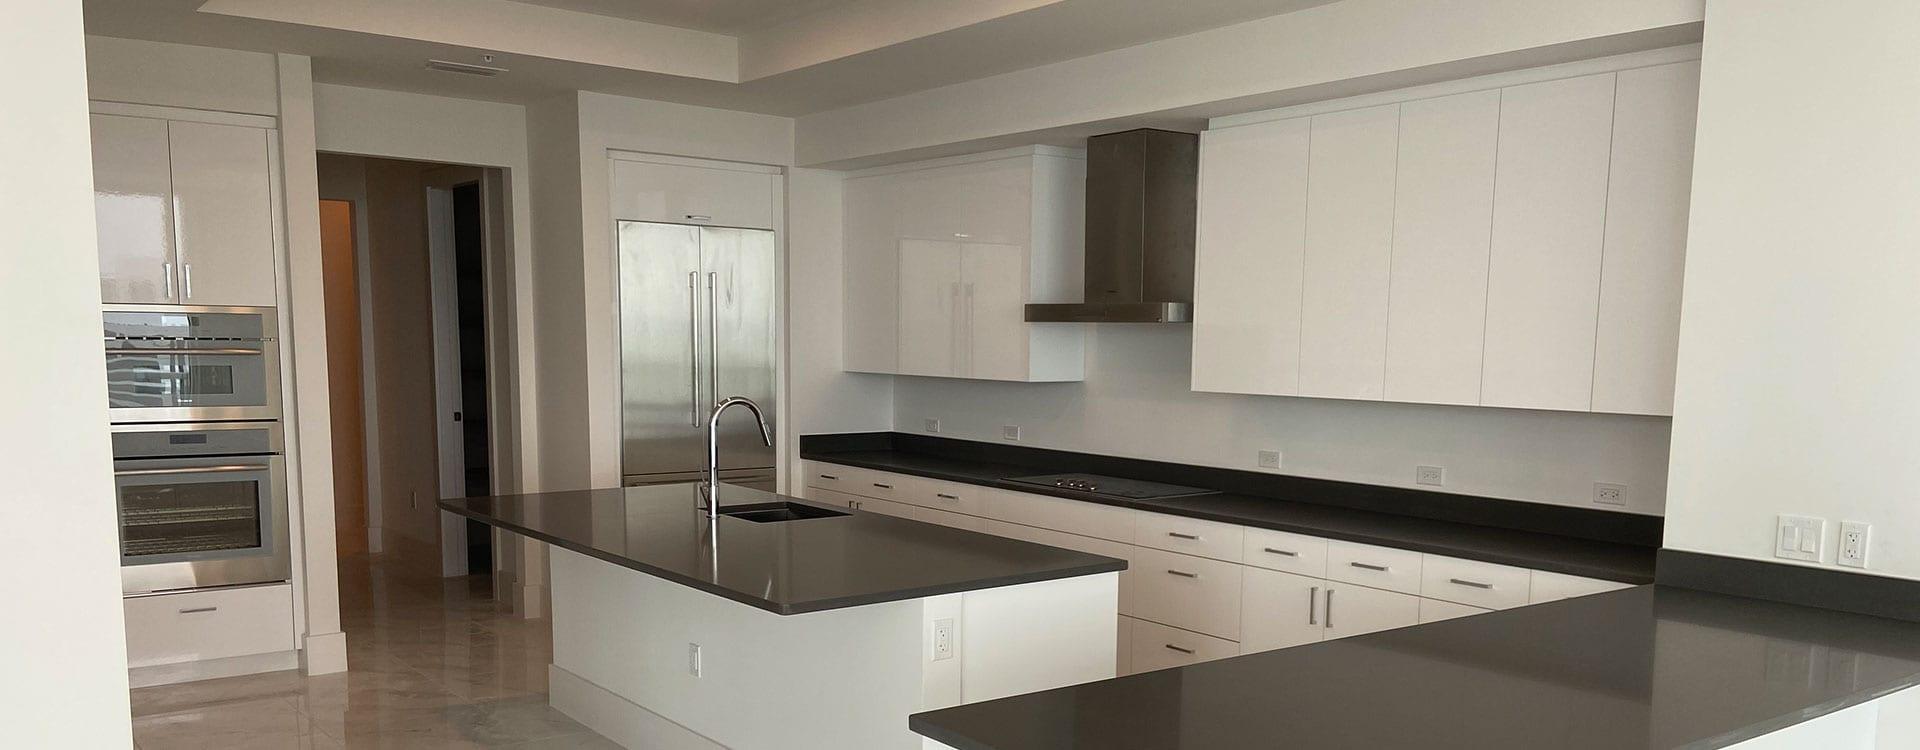 BLVD Residence 1102 Kitchen